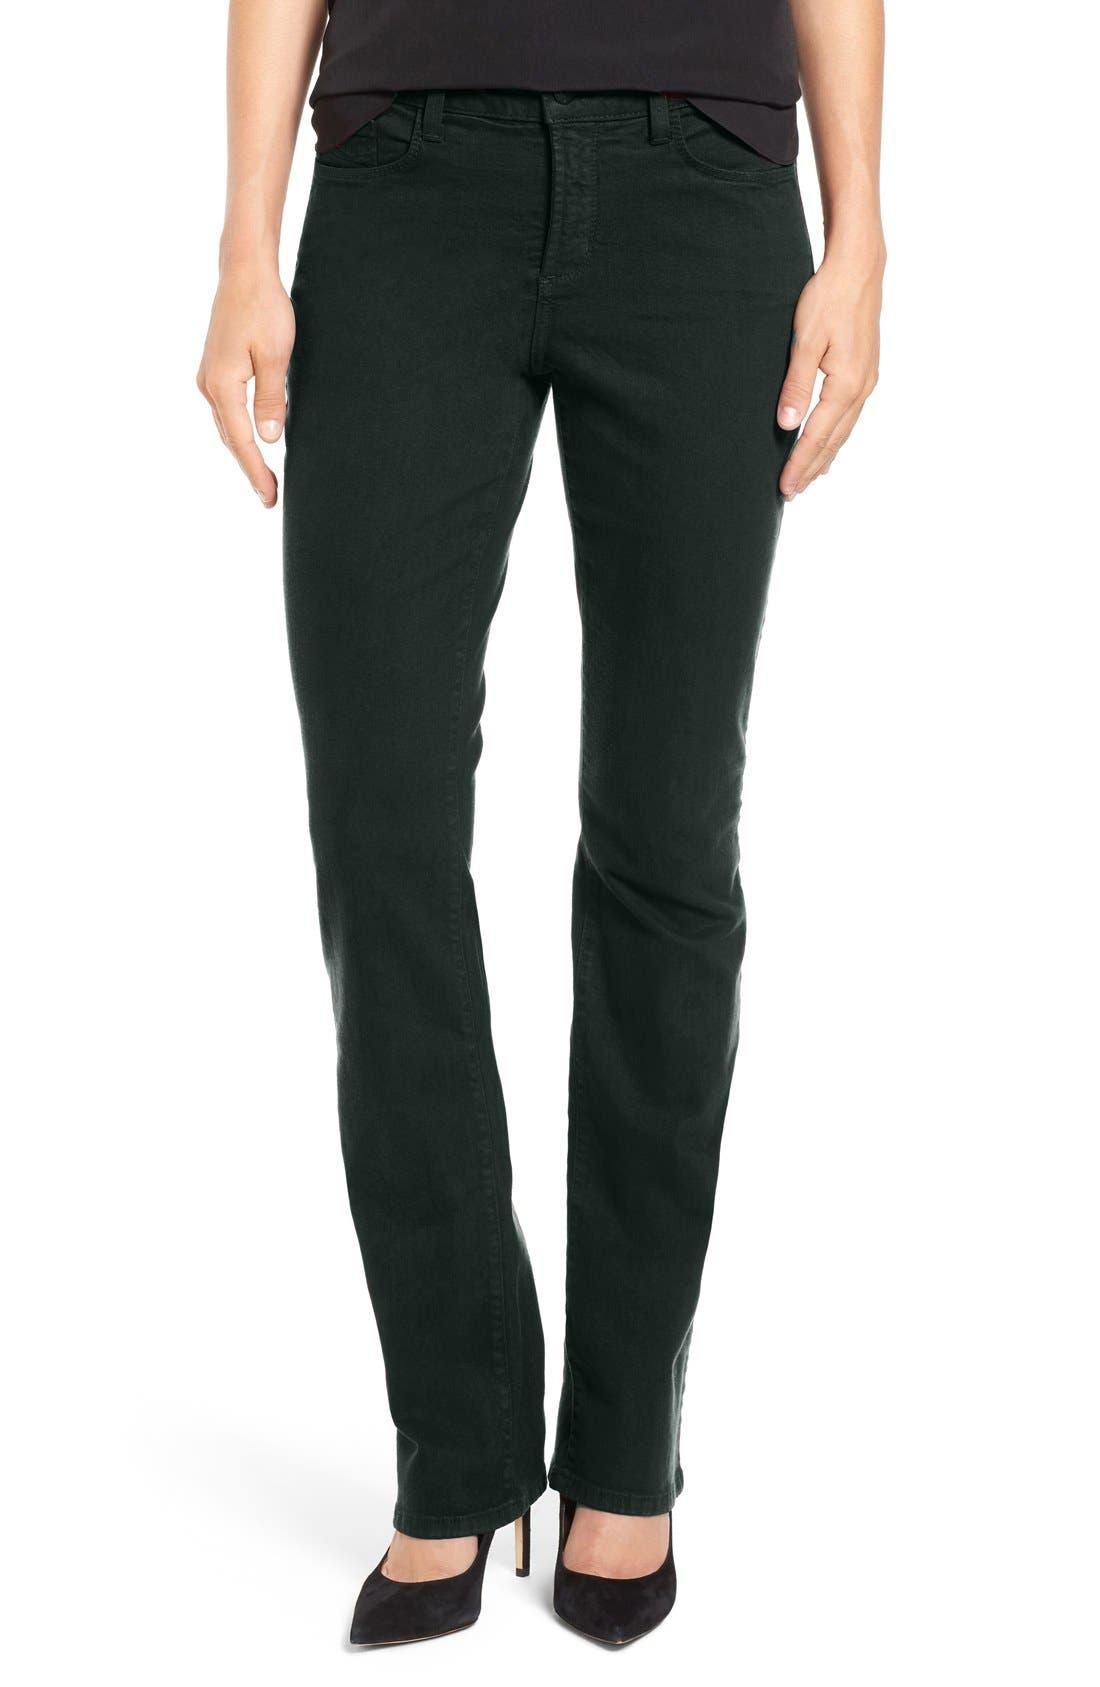 Alternate Image 1 Selected - NYDJ Sheri Stretch Skinny Jeans (Regular & Petite)